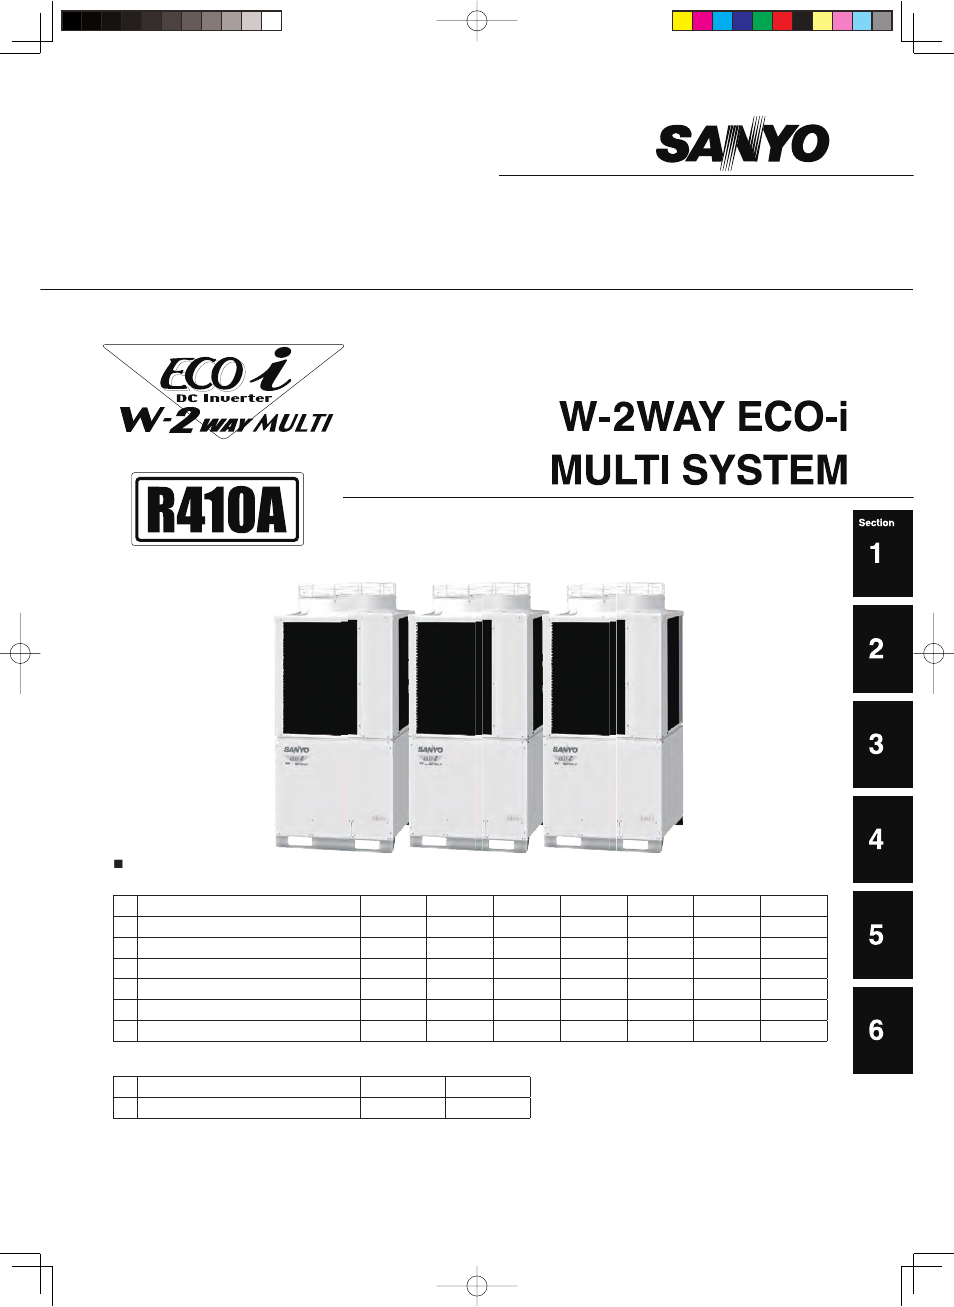 Sanyo Hdtv Manual 20082012 Chevy Malibu Reese Tconnector Wiring Harness 78066 Array Eco I Service Manuals Library U2022 Rh 45 32 224 239